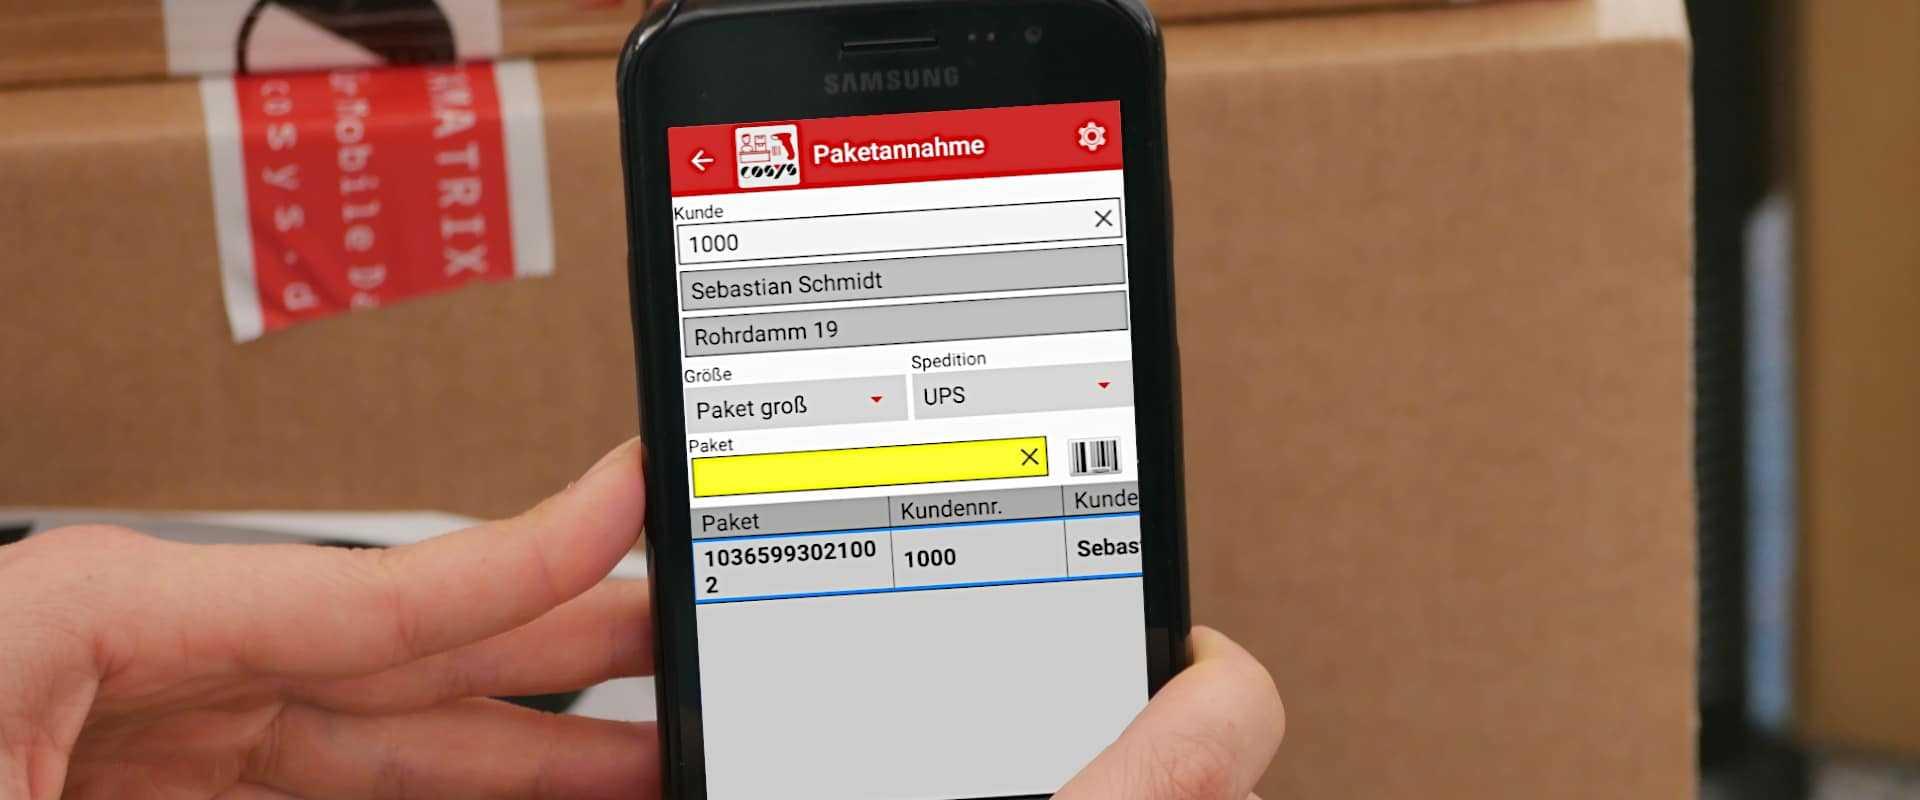 COSYS Paketshop App auf Samsung xcover 4